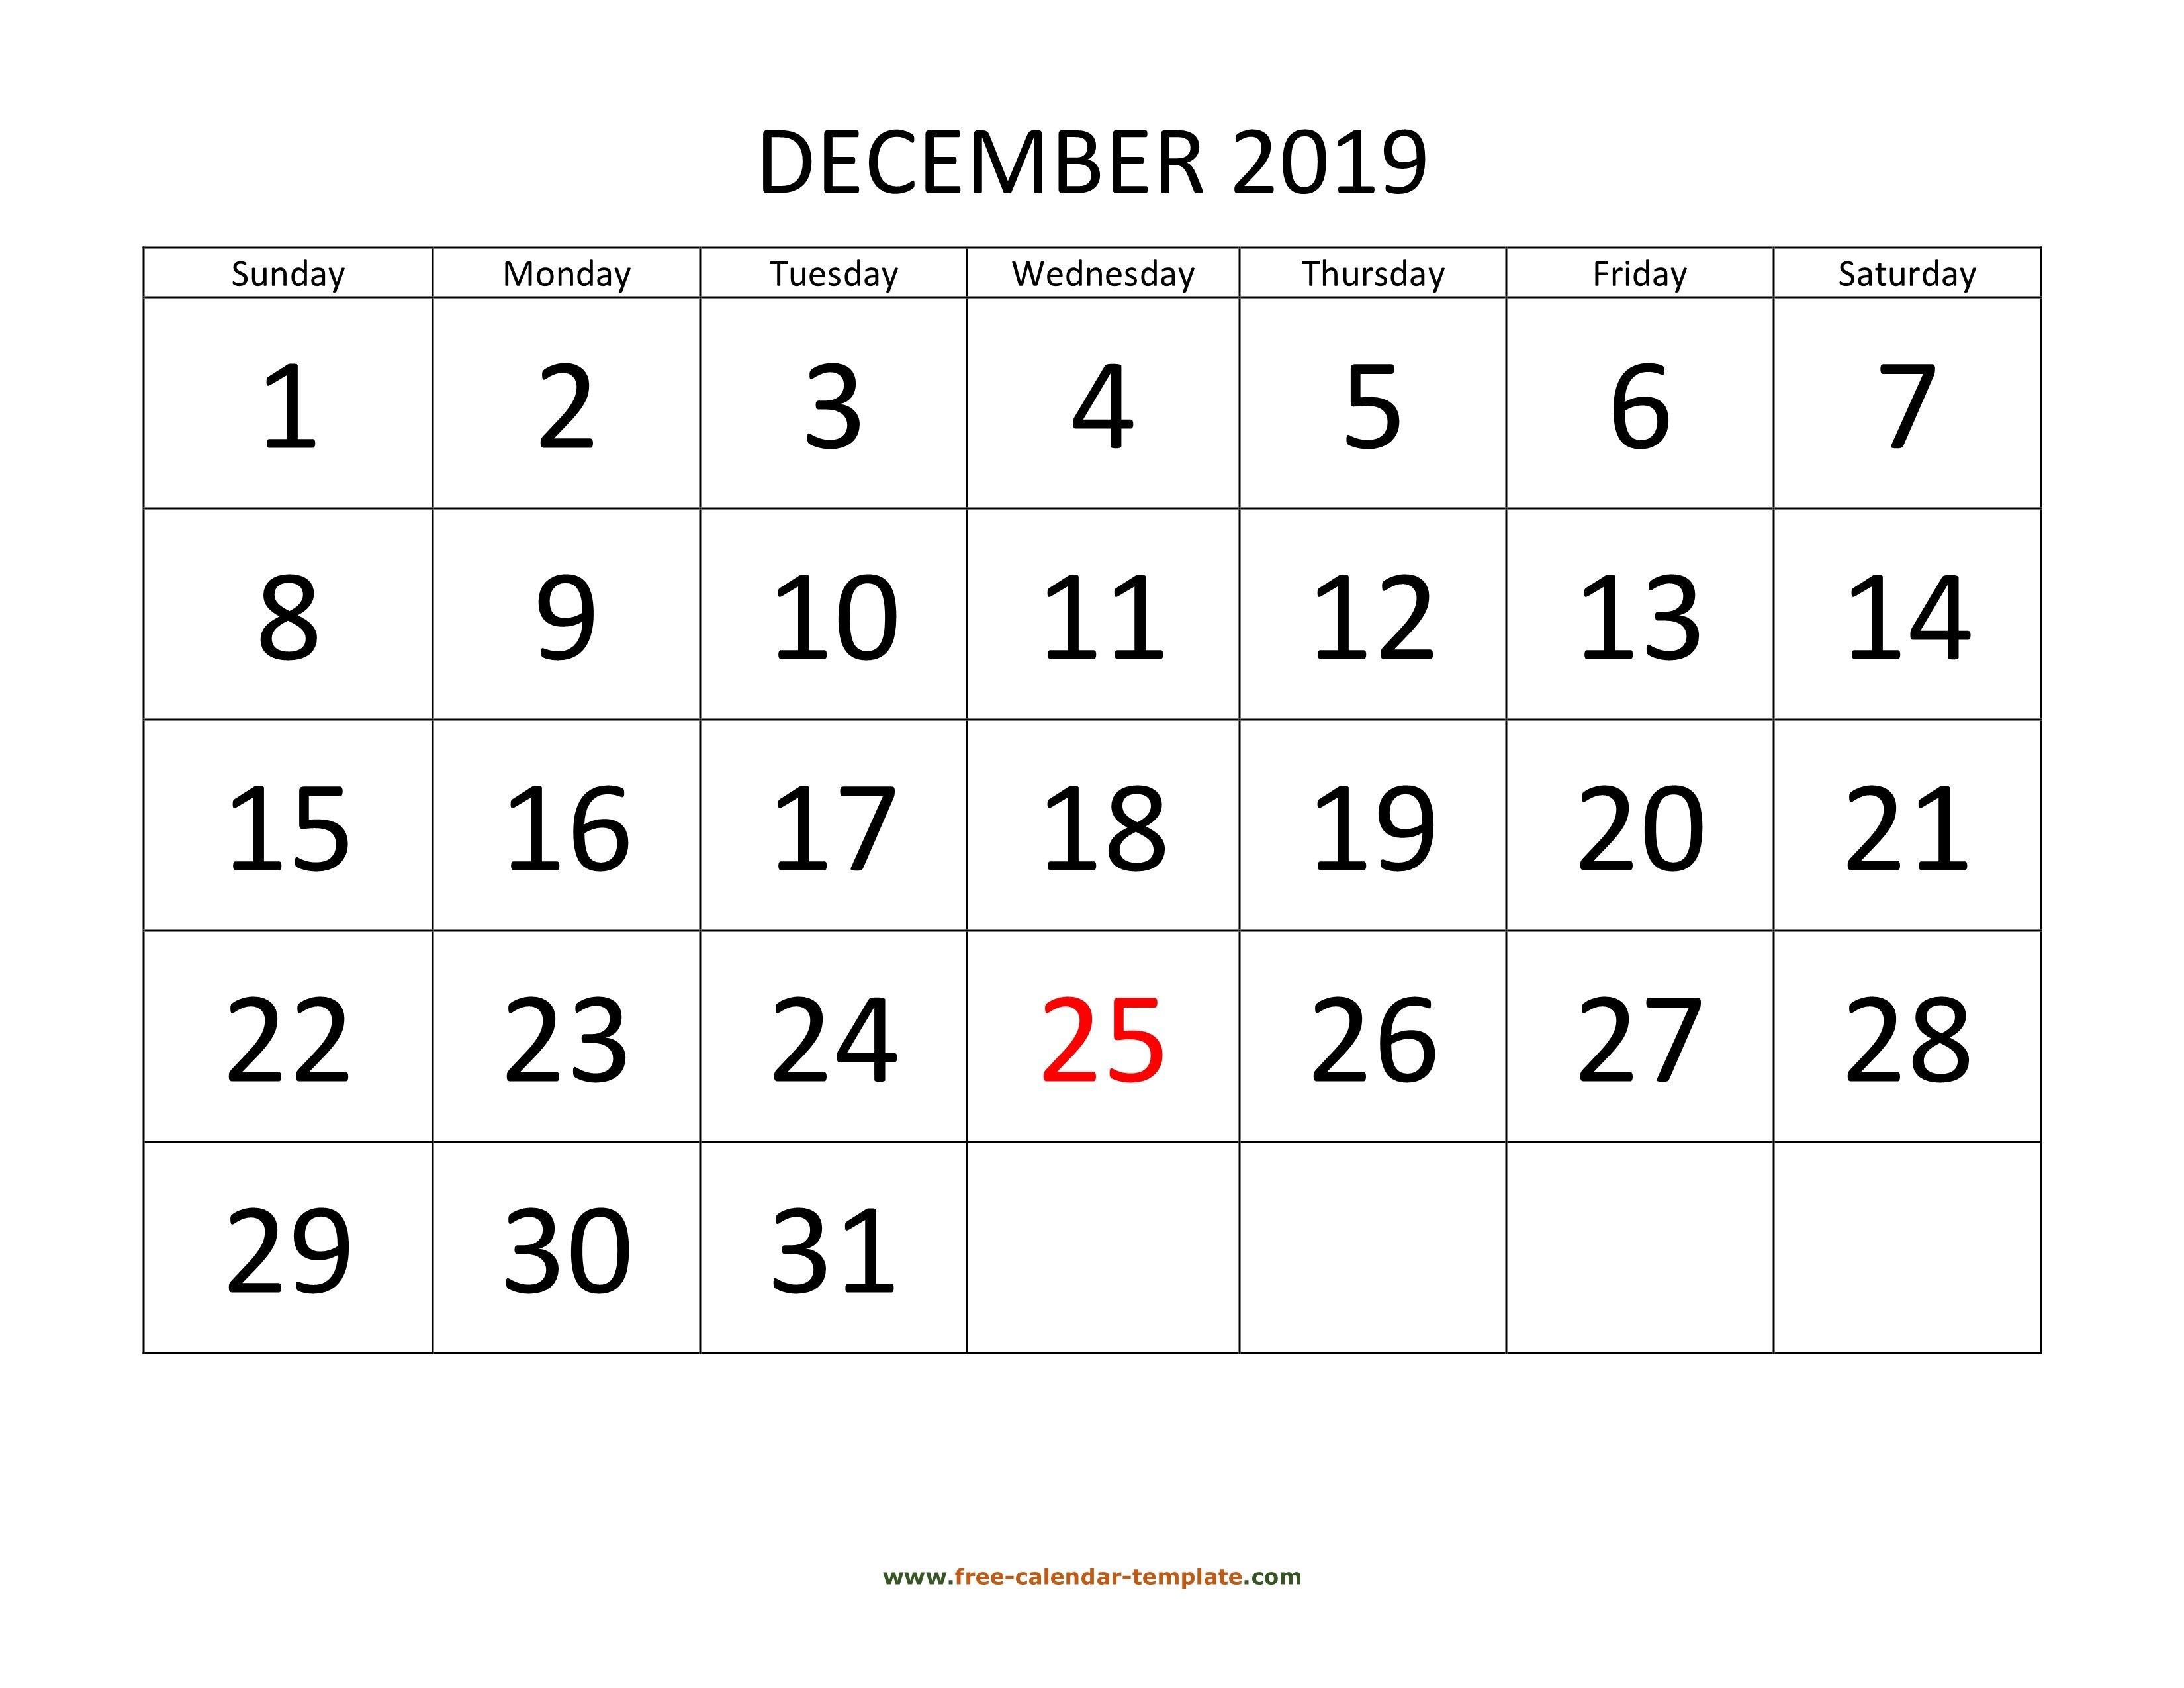 December 2019 Free Calendar Tempplate | Free-Calendar Free Calendars You Can Edit